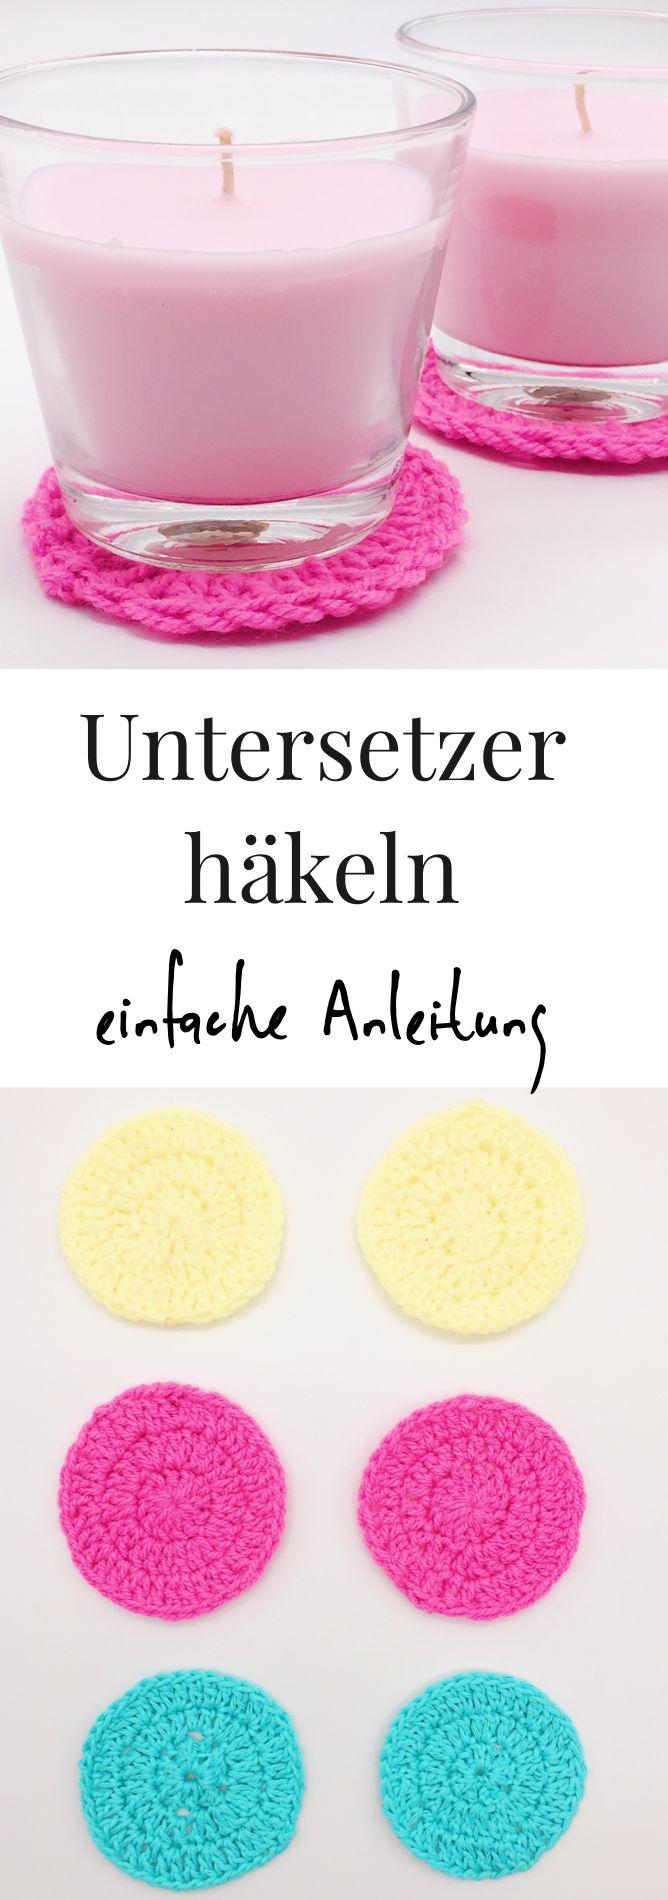 1070 best Häkeln images on Pinterest | Crochet, Knit crochet and ...